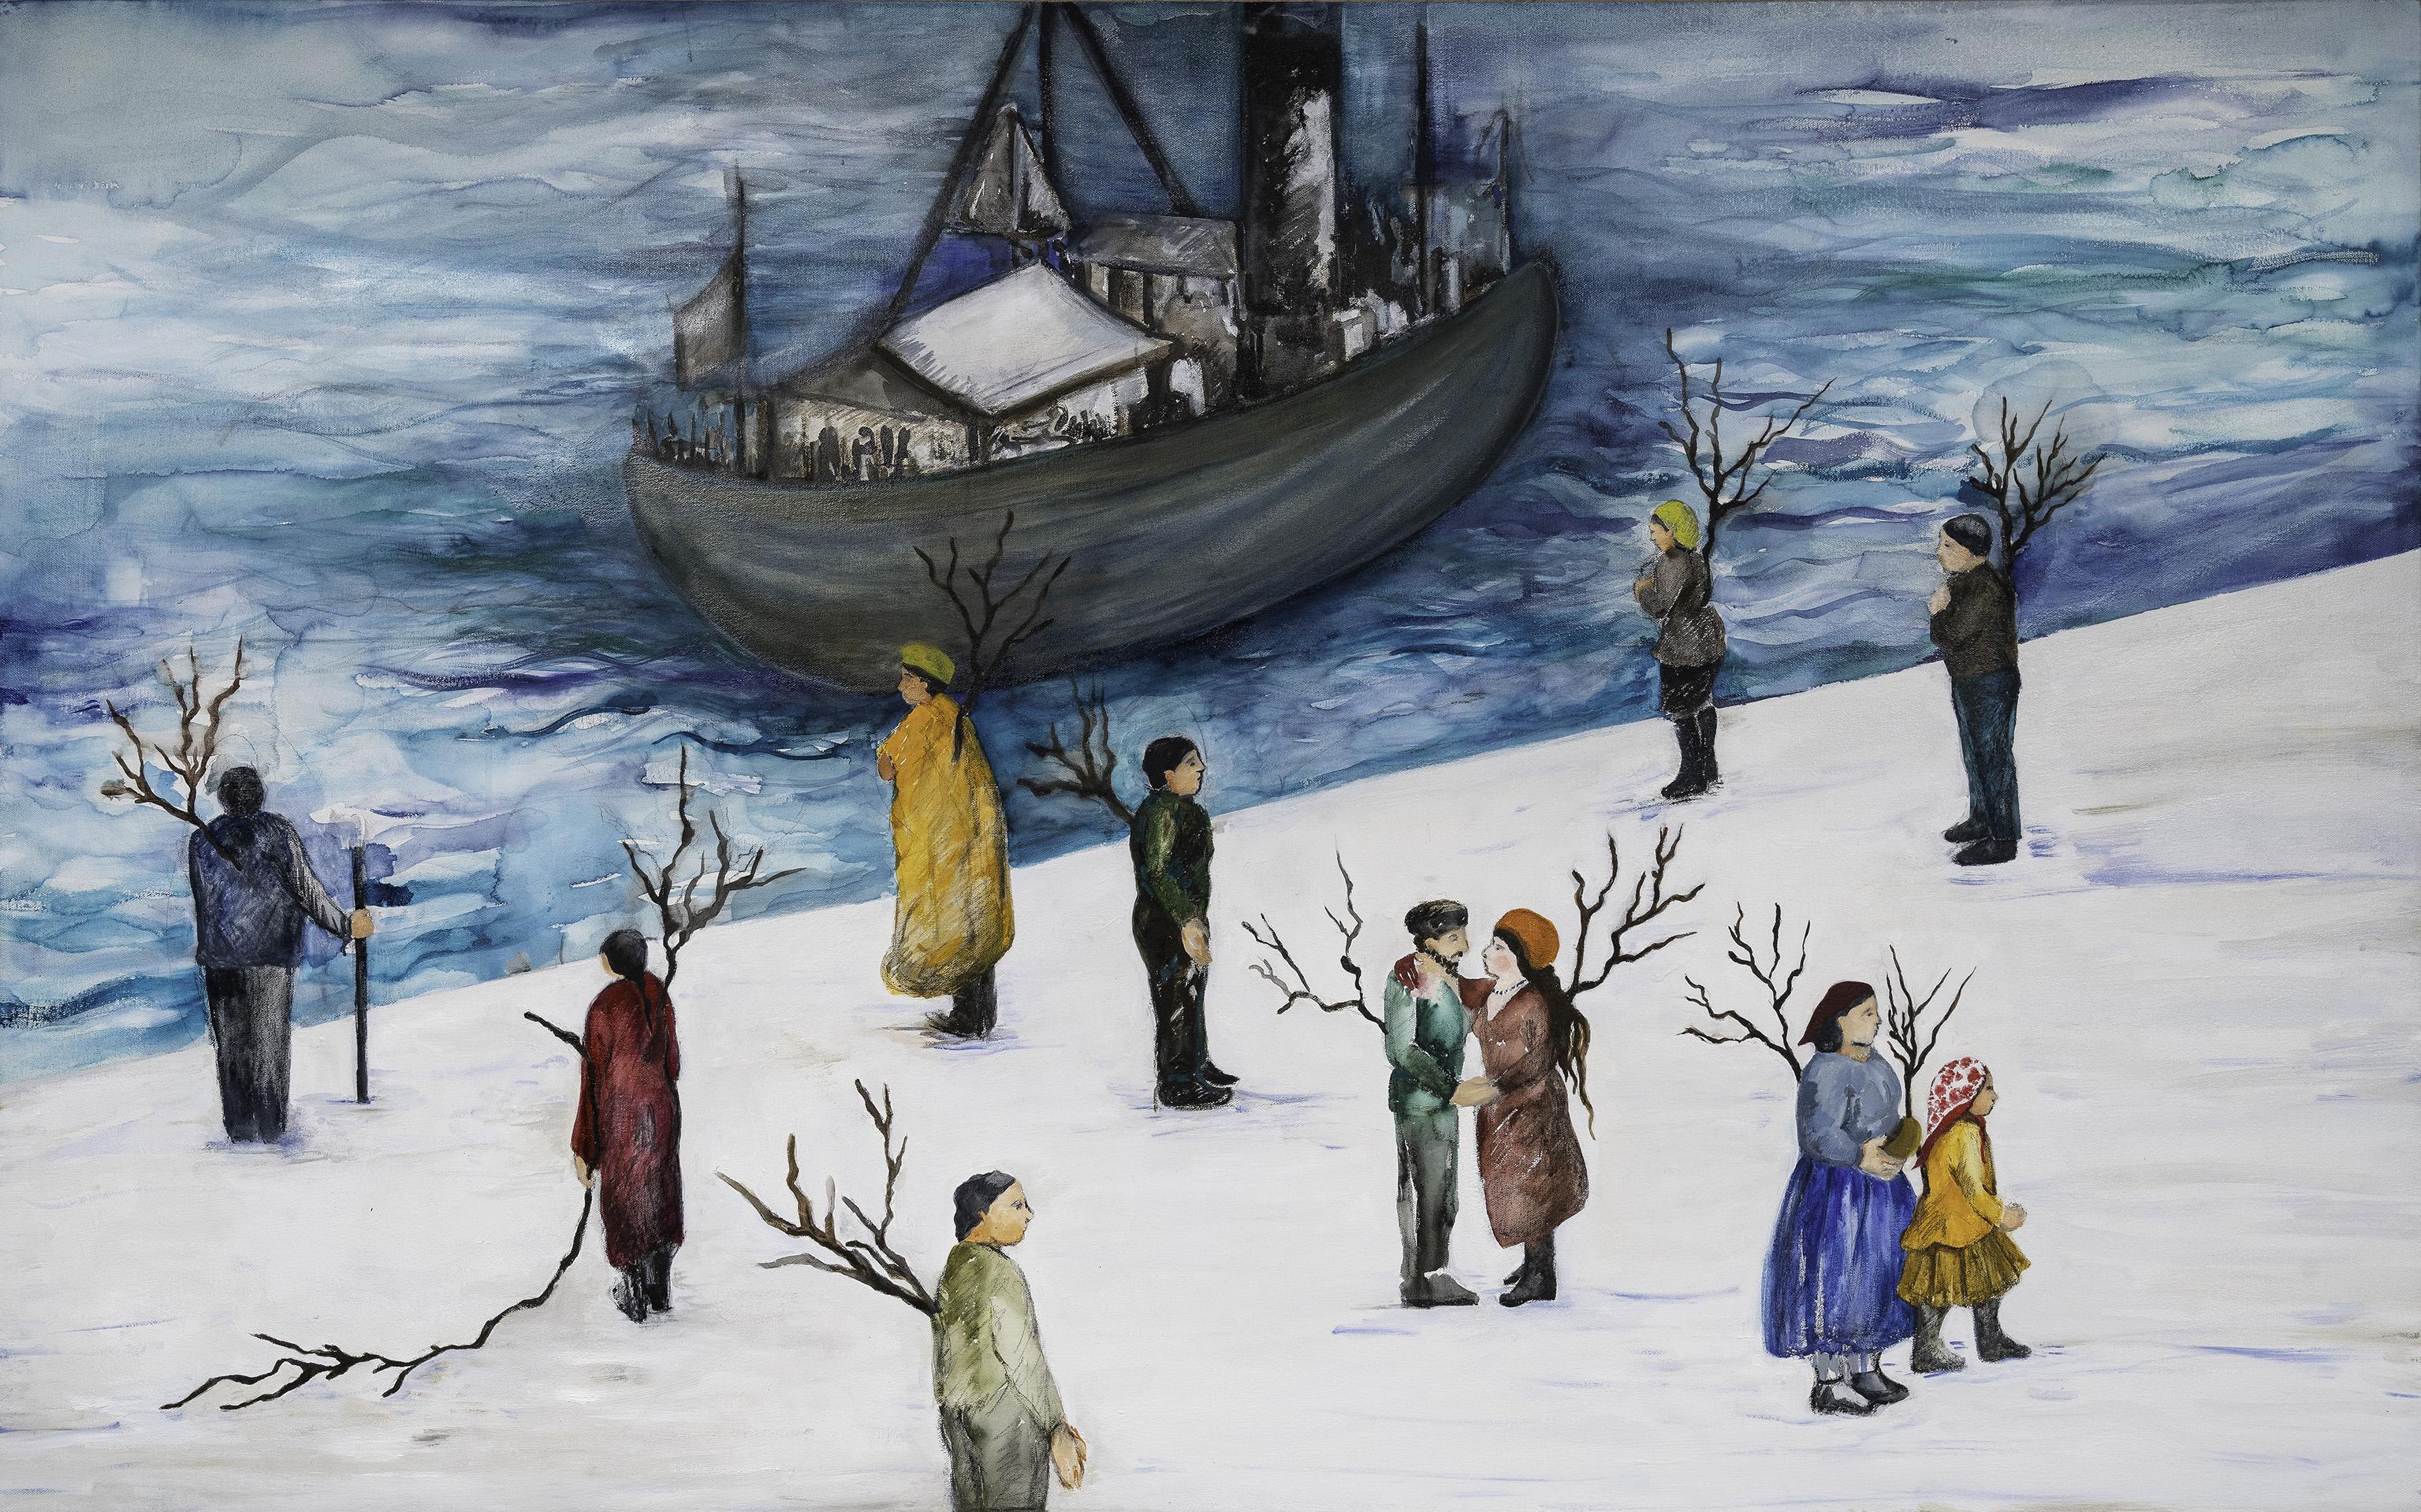 02 Monica Dower, Serie Buscando raíces, Migrantes con sus raíces aéreas, 100 x 160 cm, 2019 .jpg